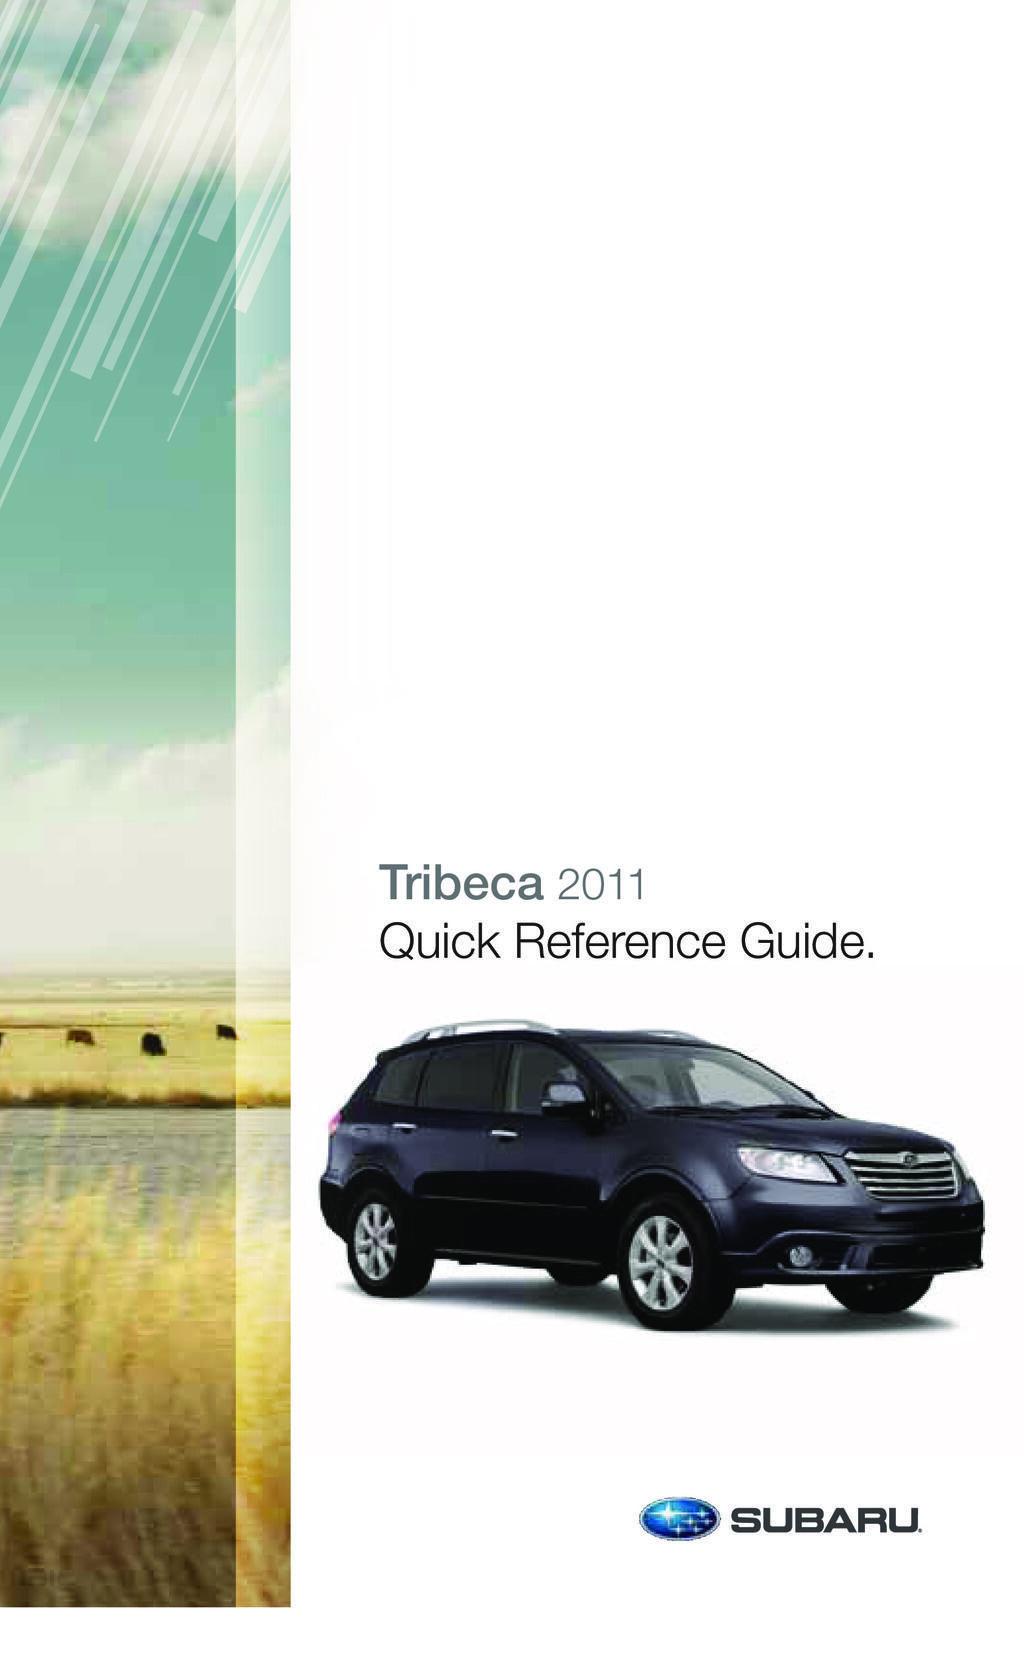 2011 Subaru Tribeca owners manual